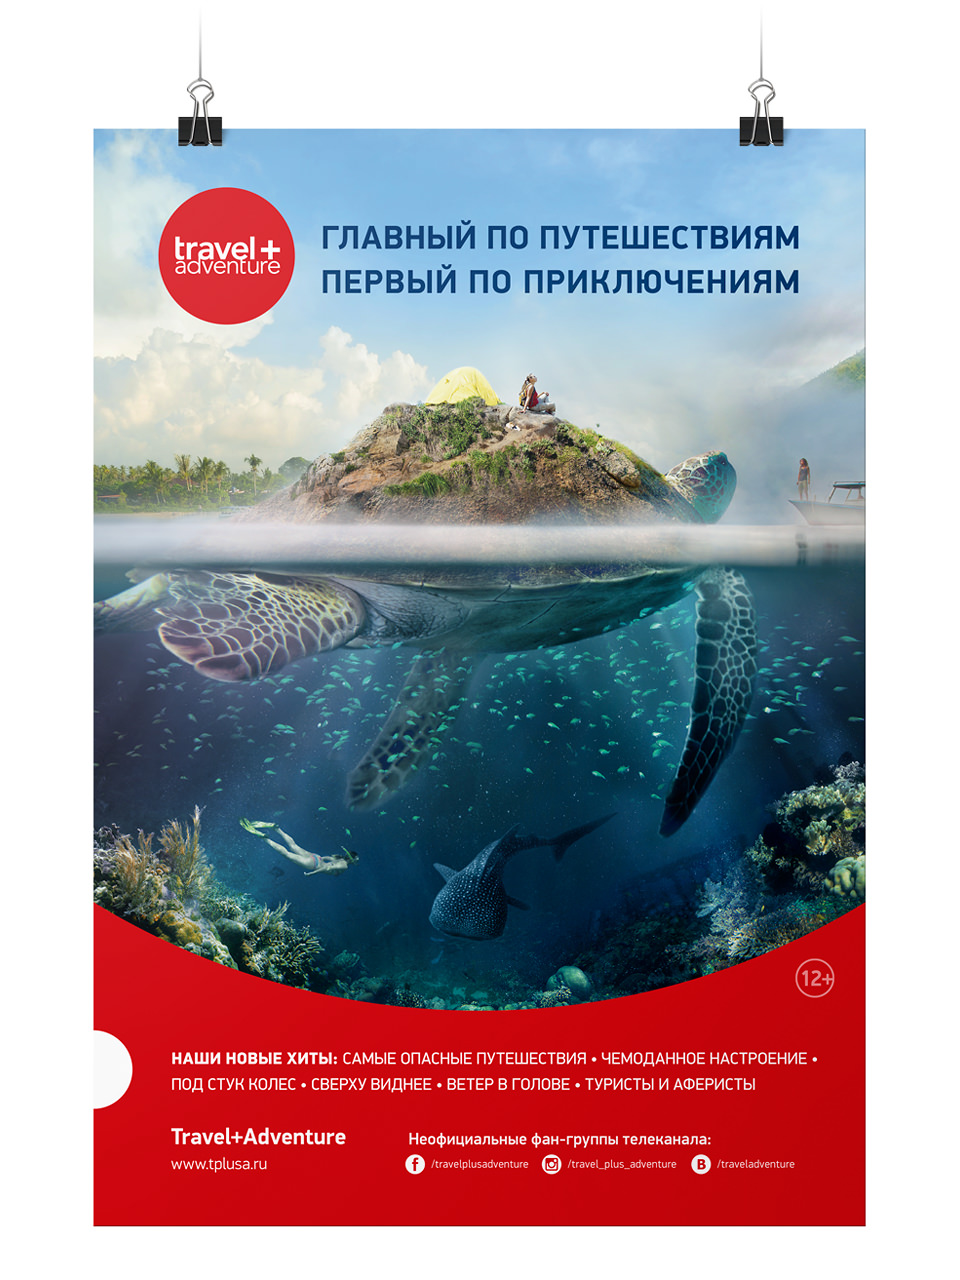 Дизайн рекламного постера телеканала Travel+Adventure